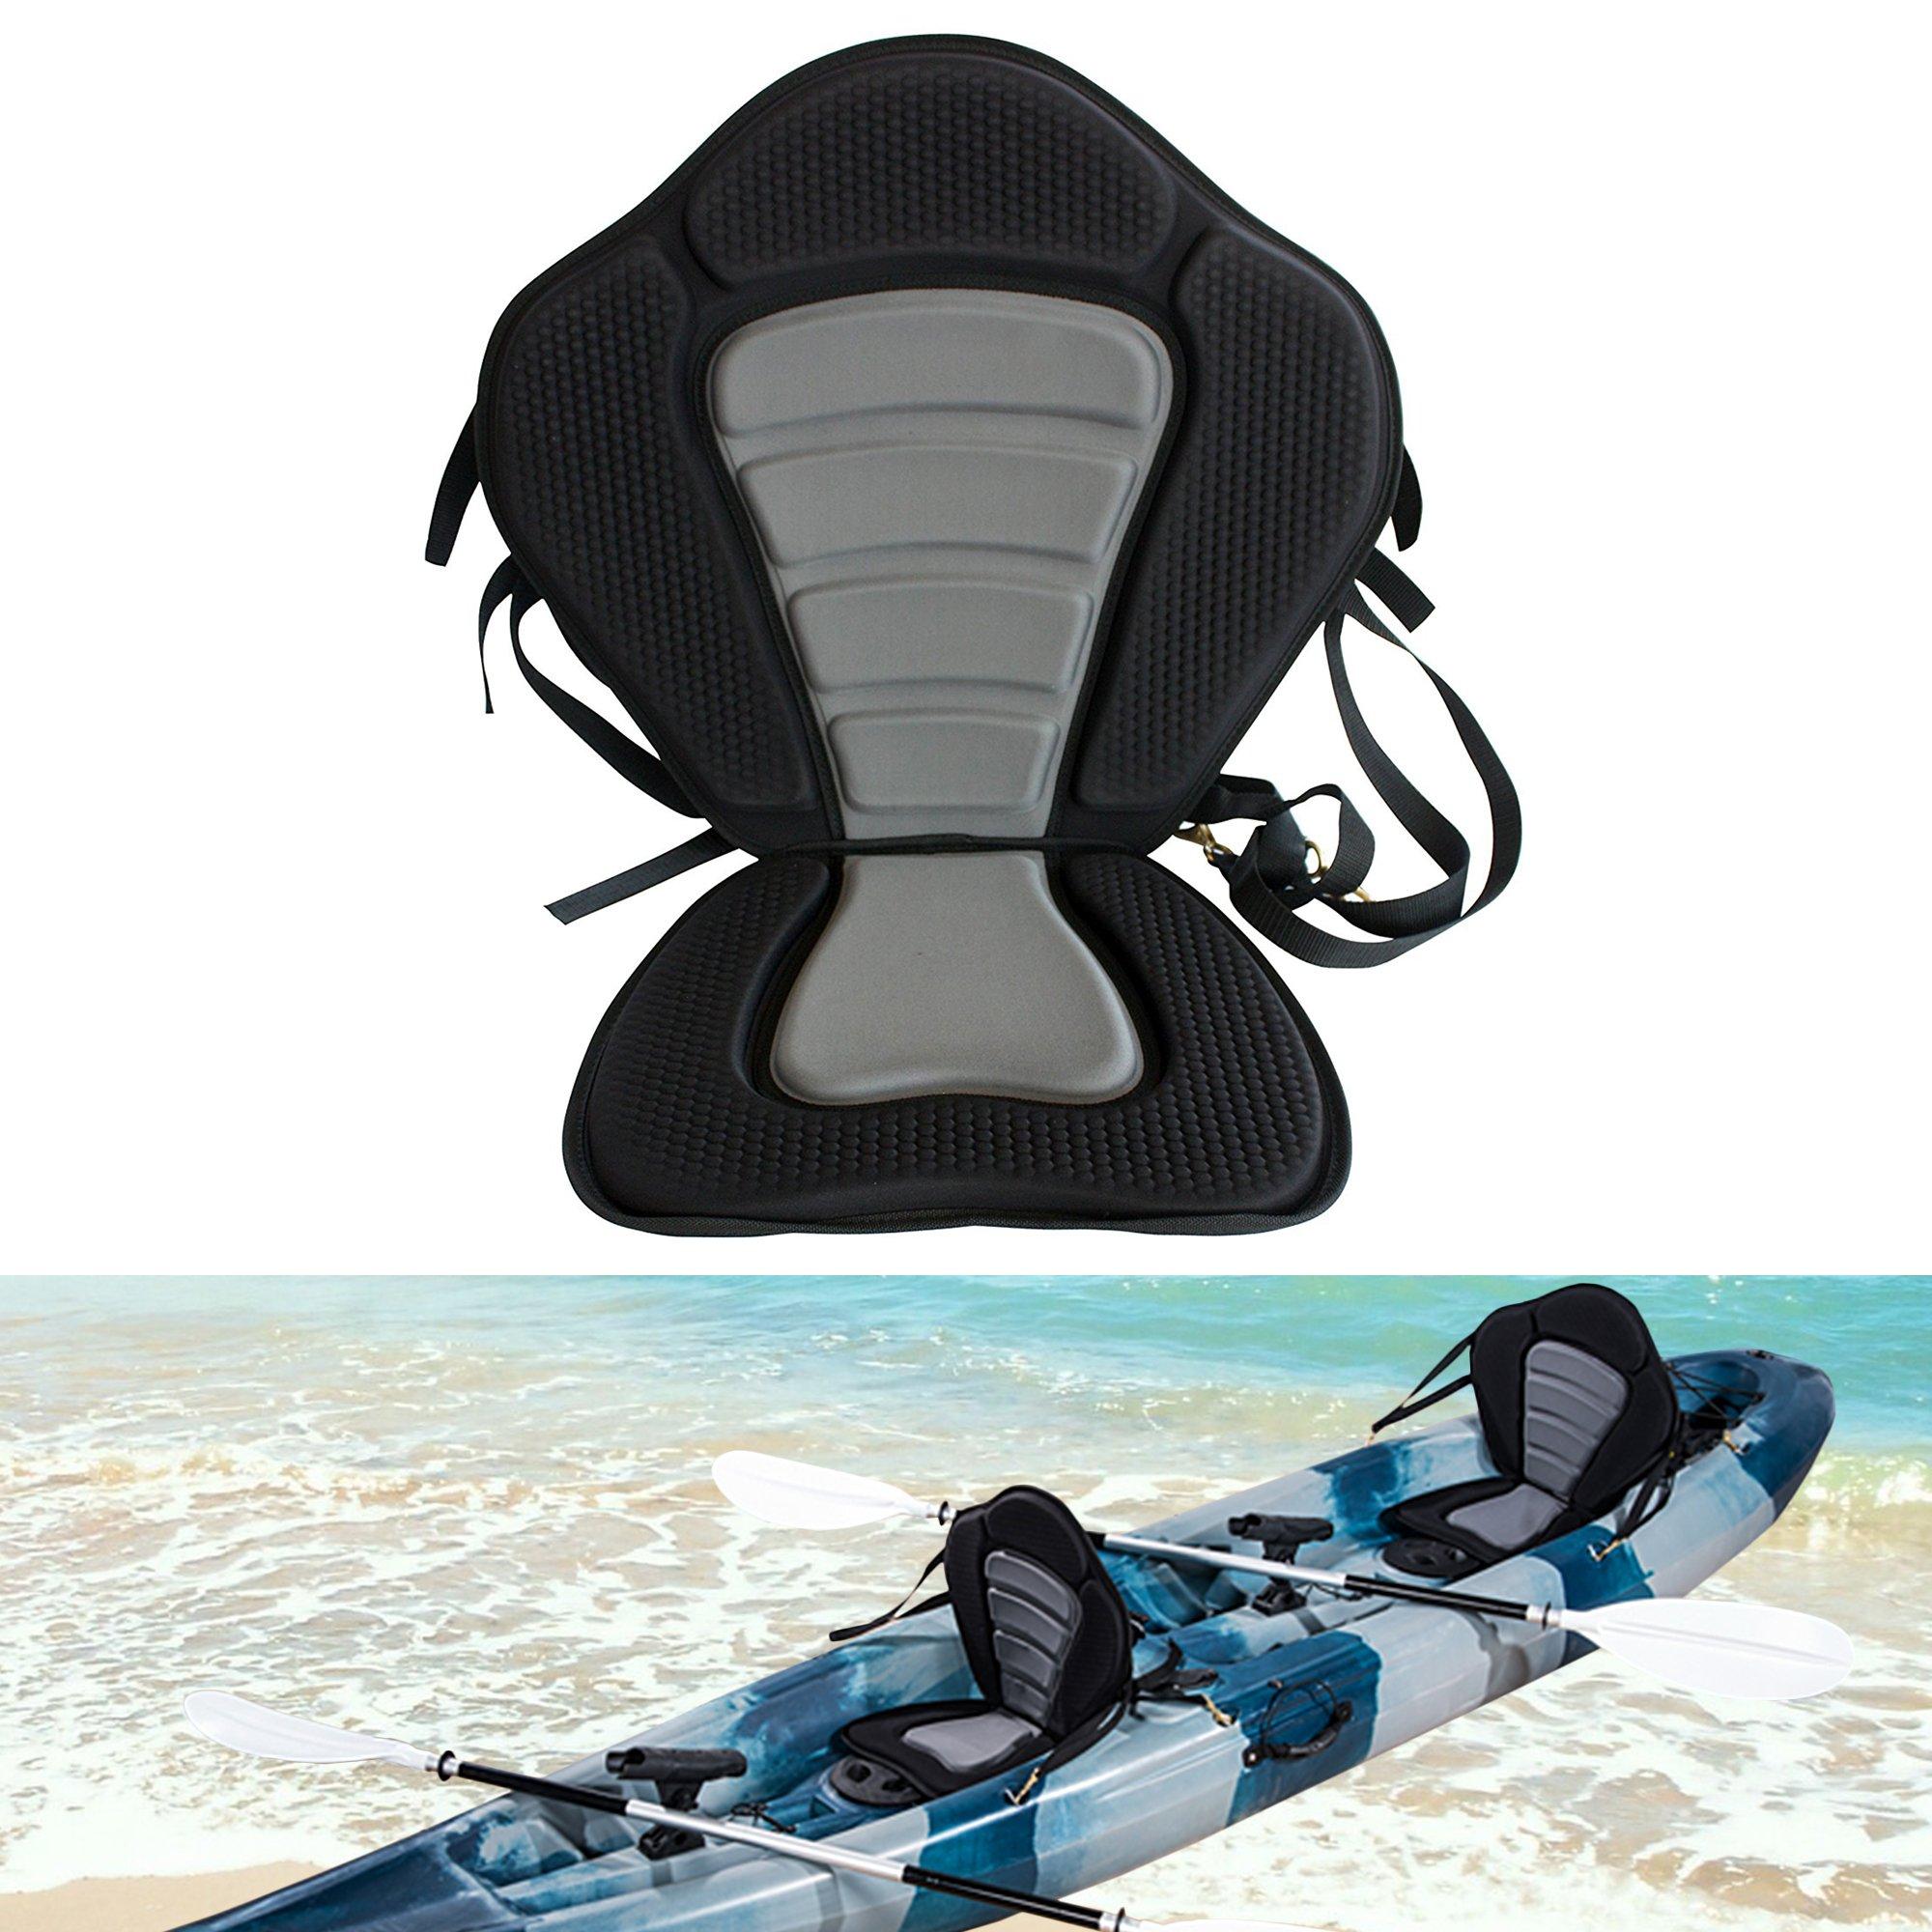 Welugnal Kayak Backrest Boating Seat,Luxury Adjustable Padded Kayak Seat Back by Welugnal